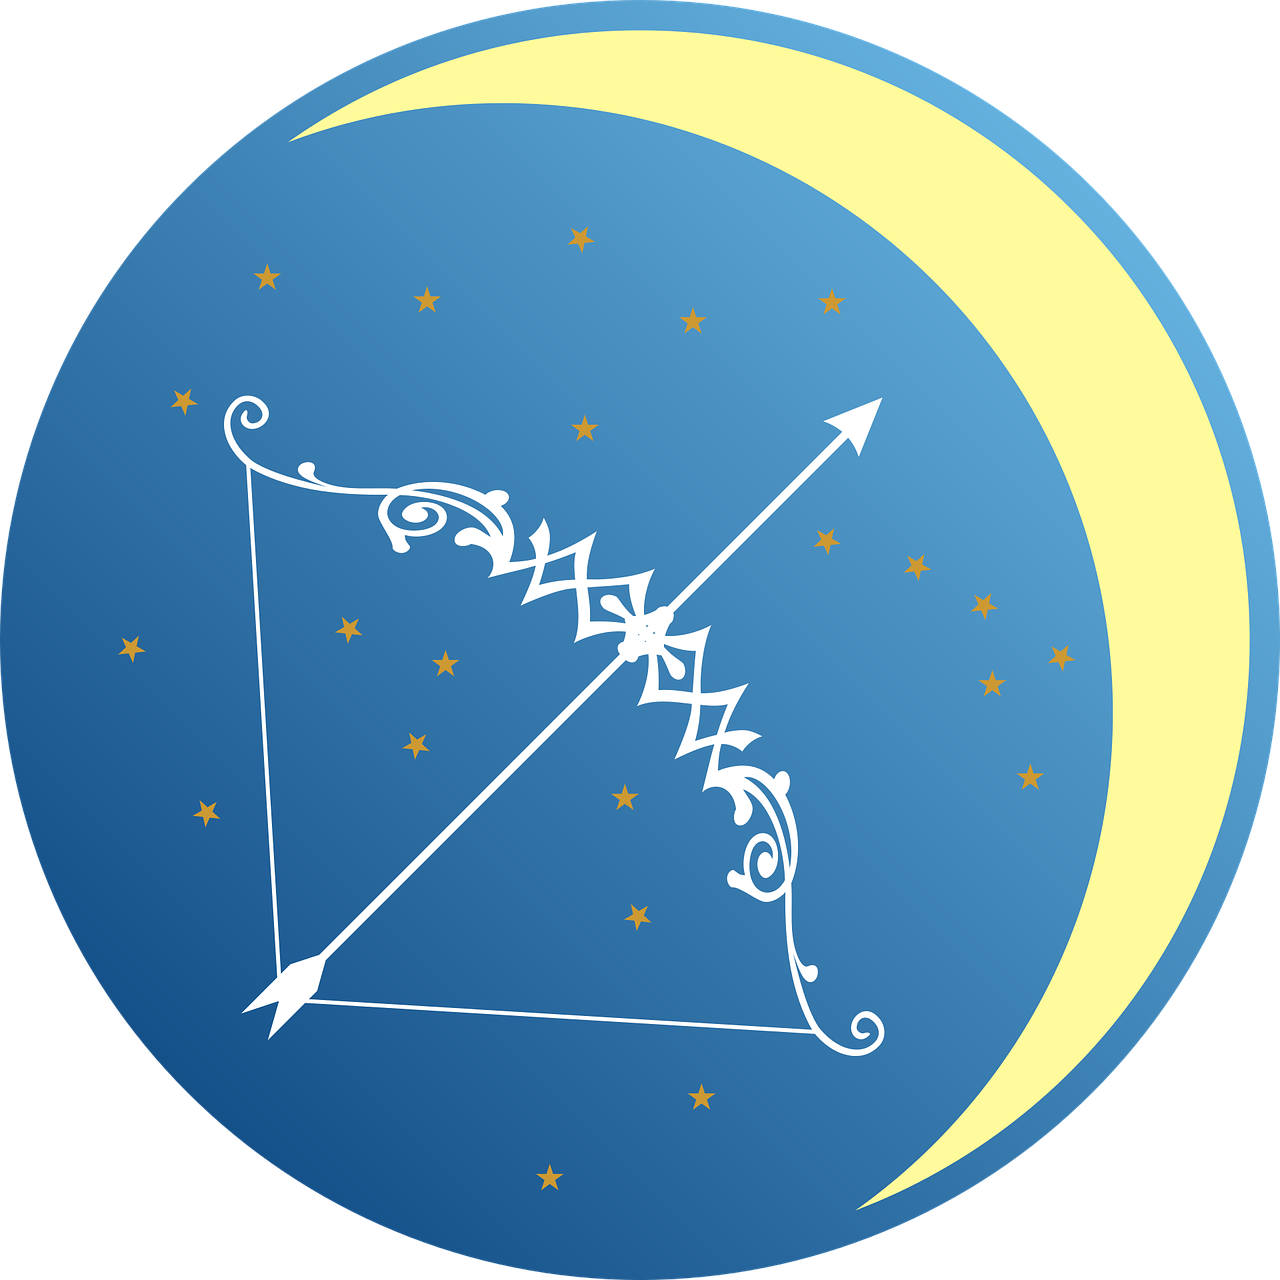 sagittarius-2288323_1280.png